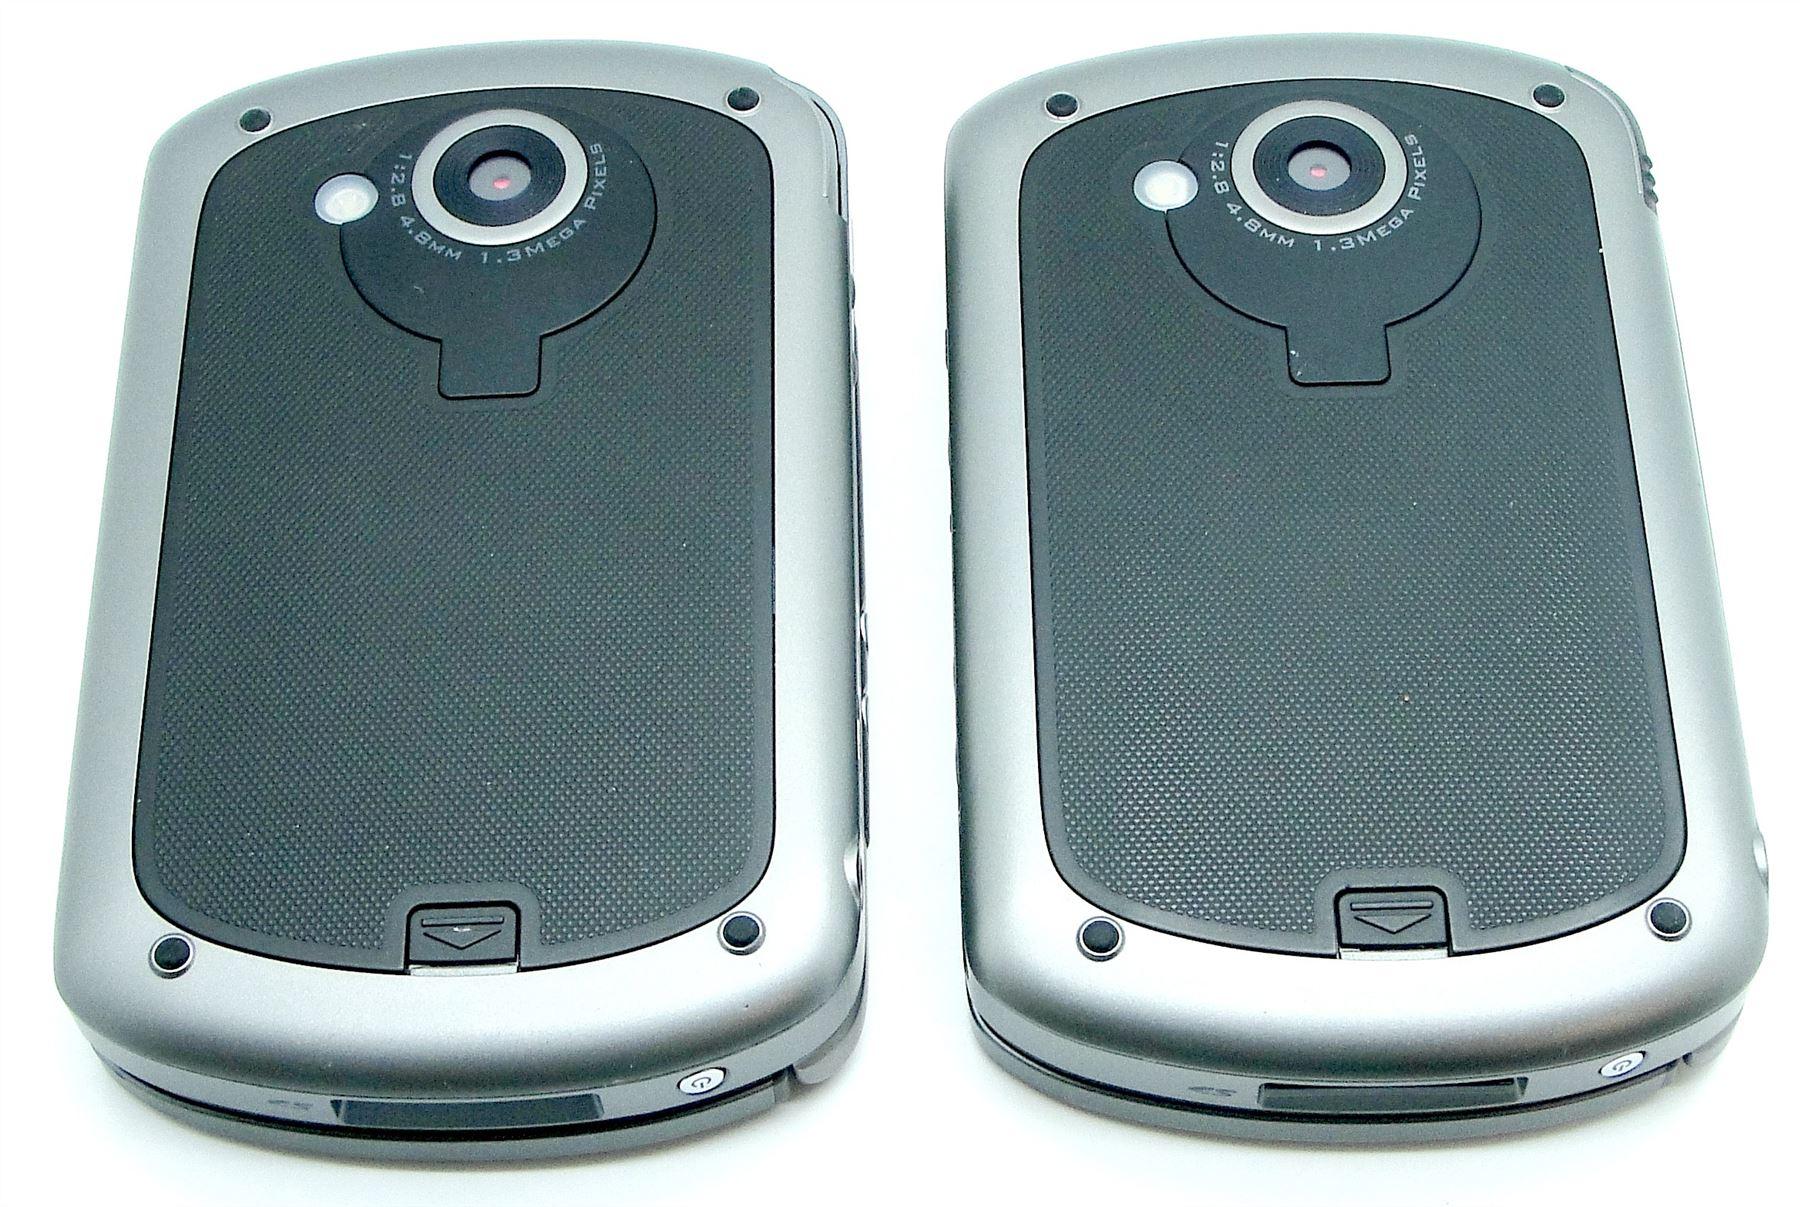 htc universal xda exec spv m5000 qtek 9000 pristine condition rh ebay co uk Universal Unlock Code HTC EVO HTC Dream